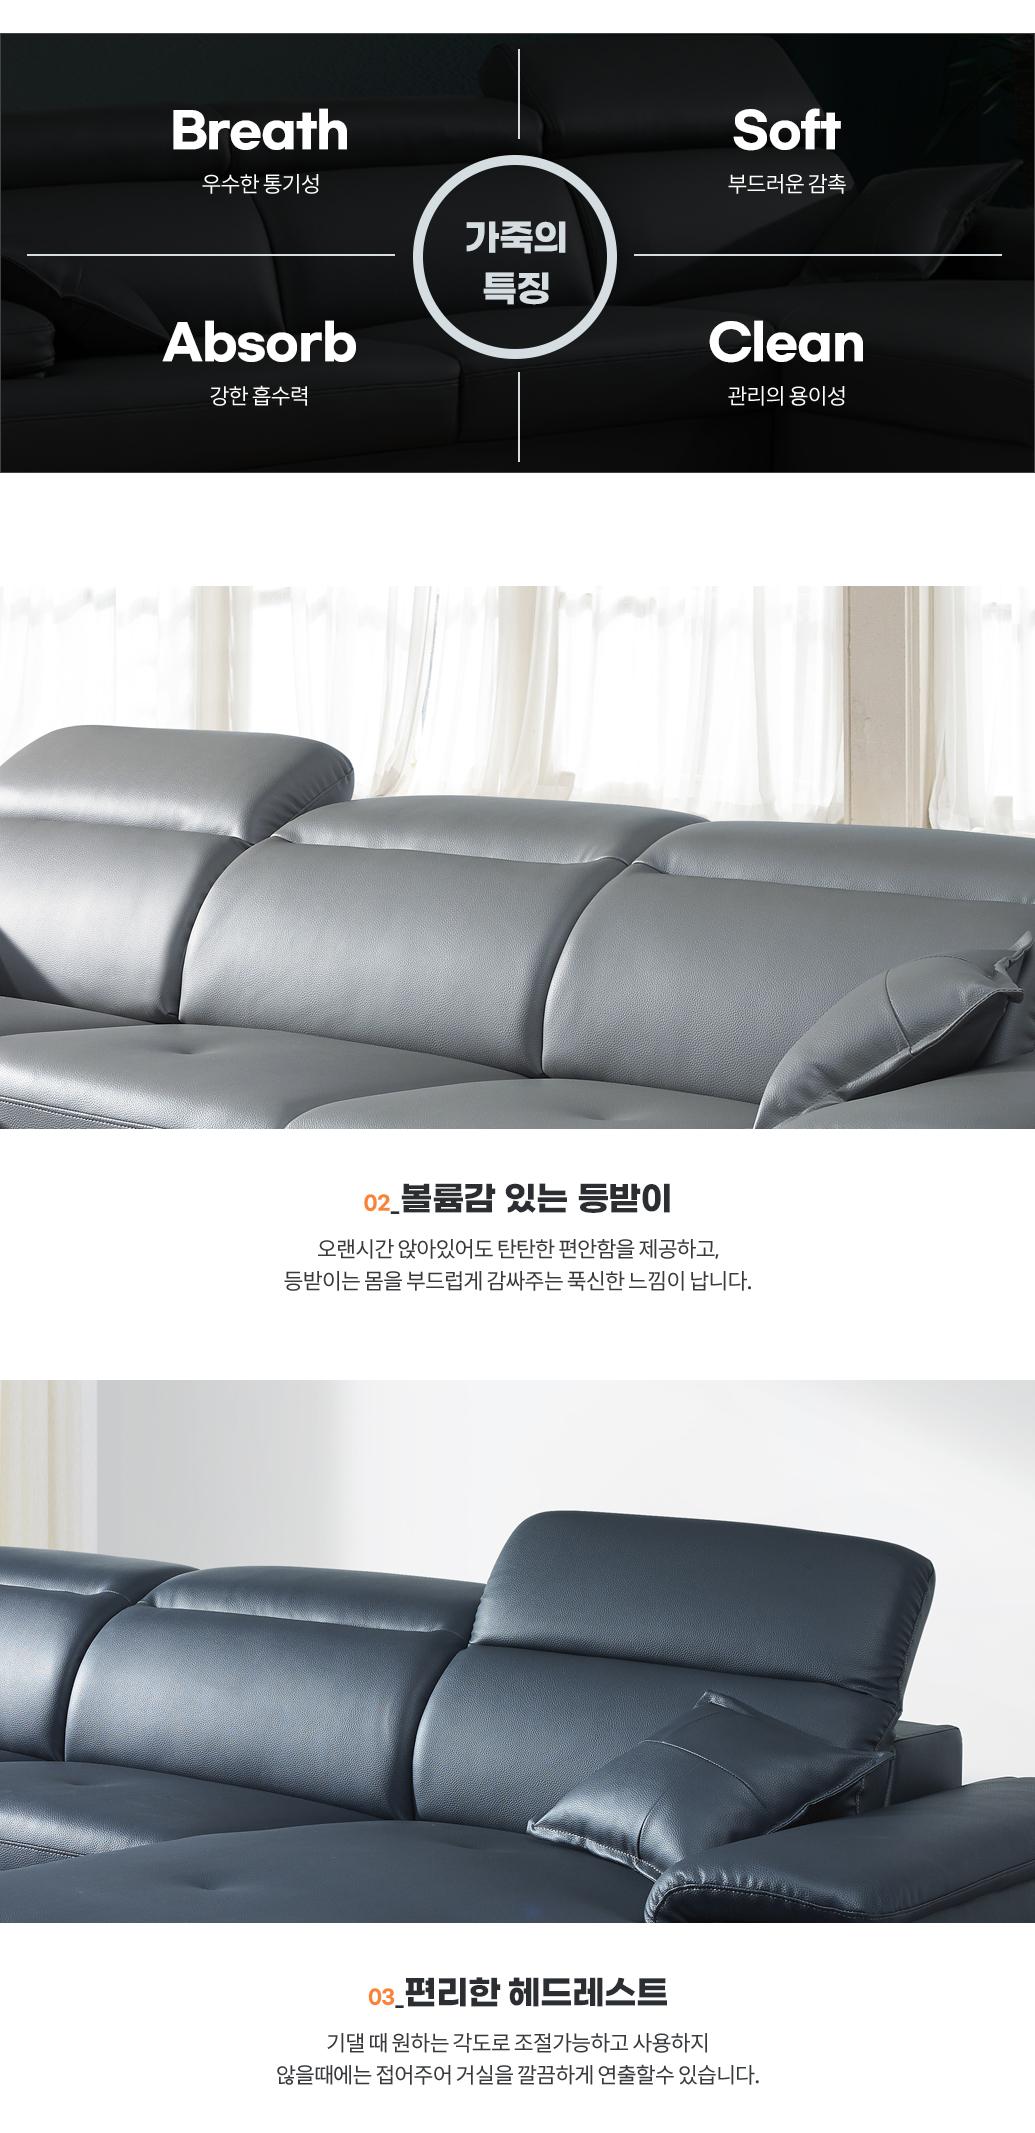 Gyua_couch_03.jpg